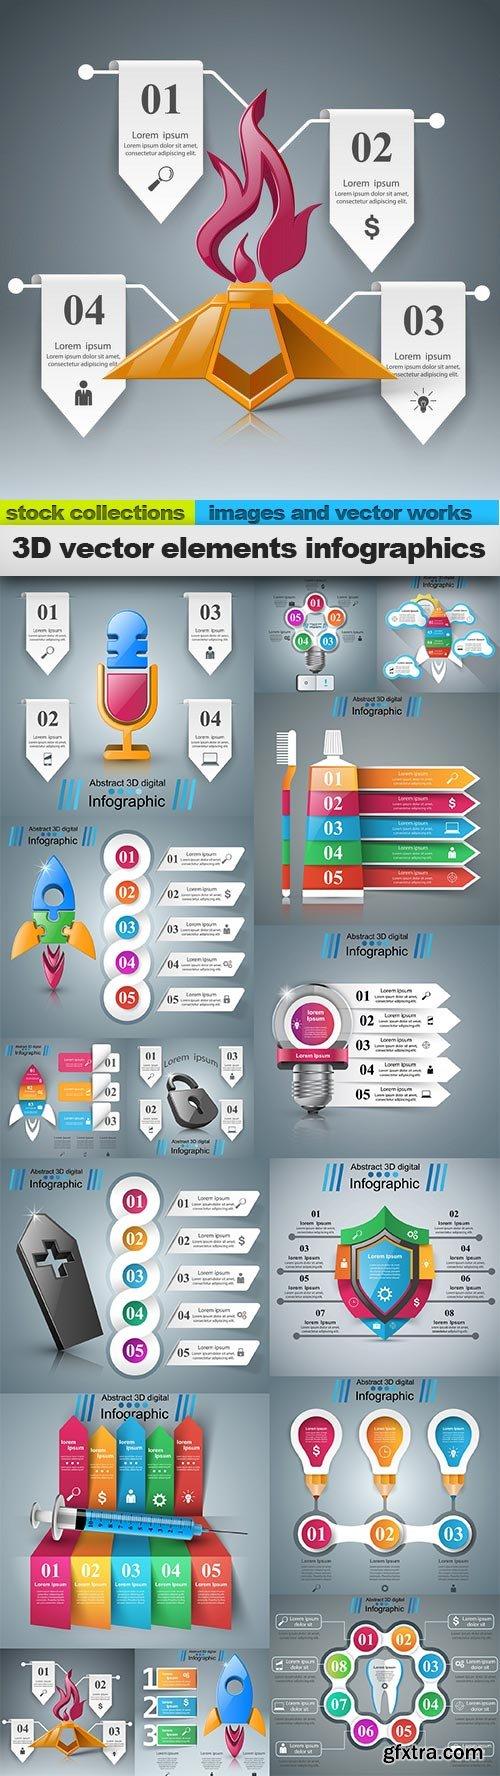 3D vector elements infographics, 15 x EPS